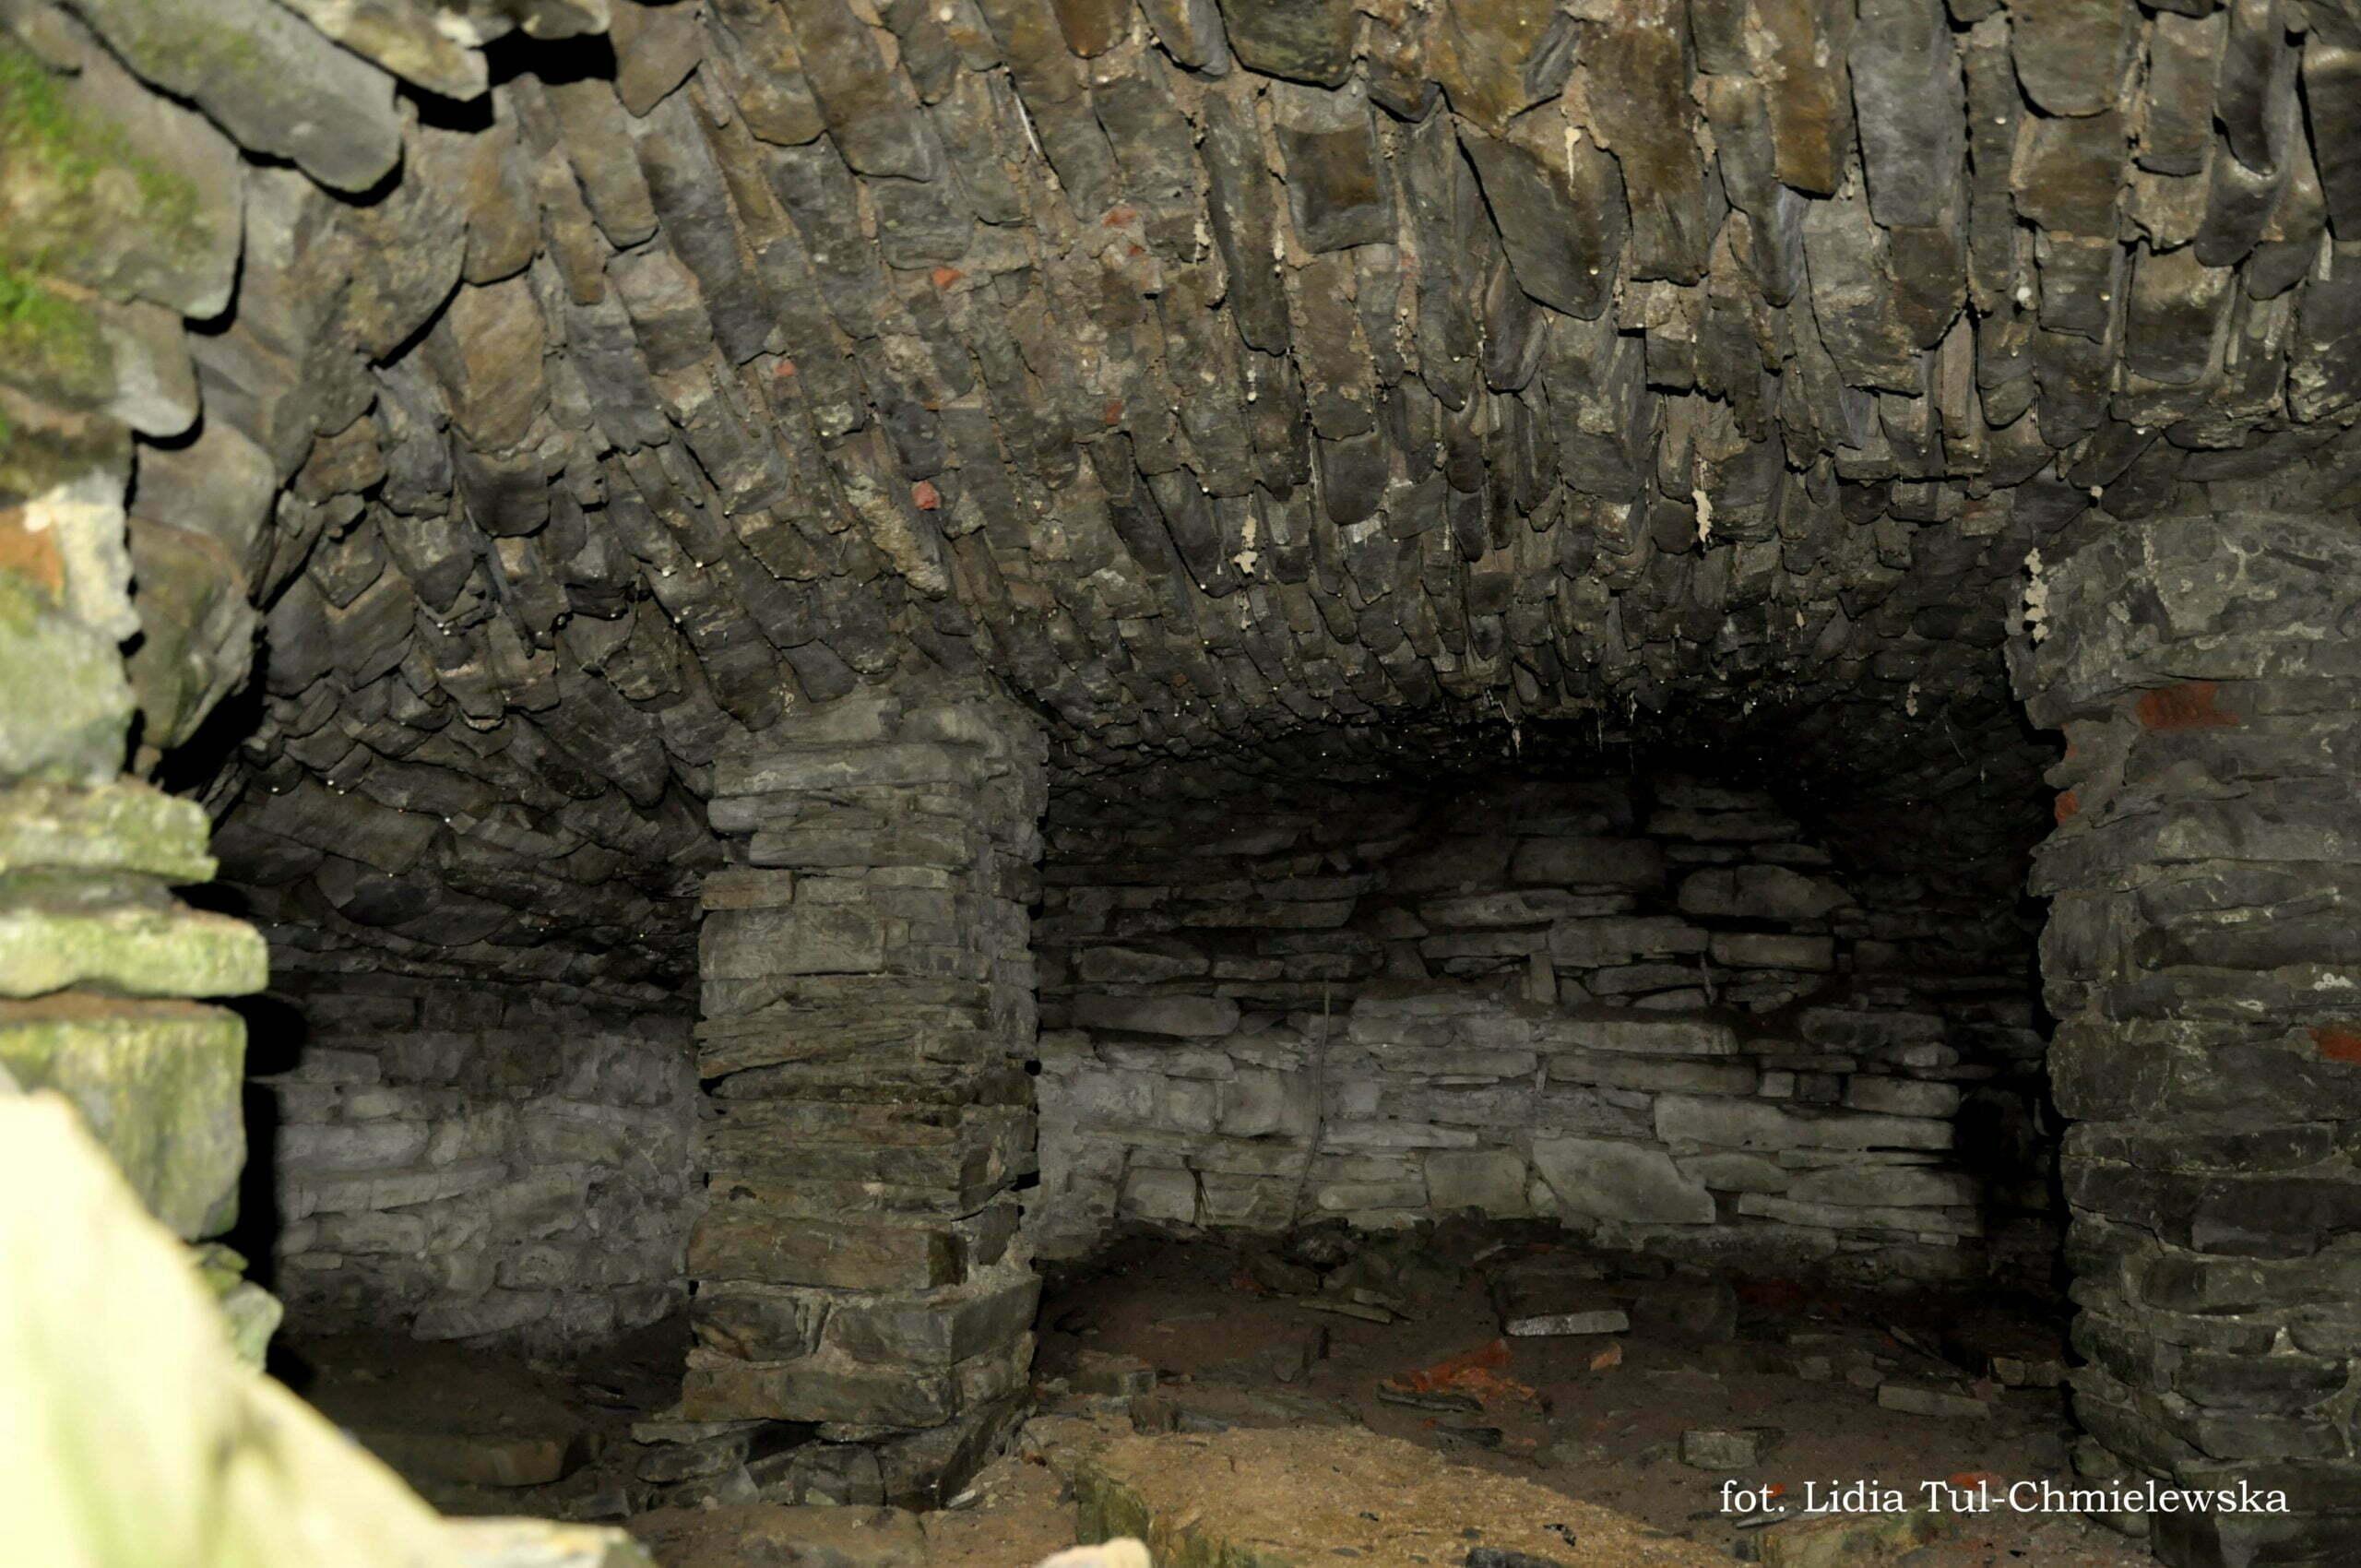 Krypta grobowa Tworylne fot. Lidia Tul-Chmielewska